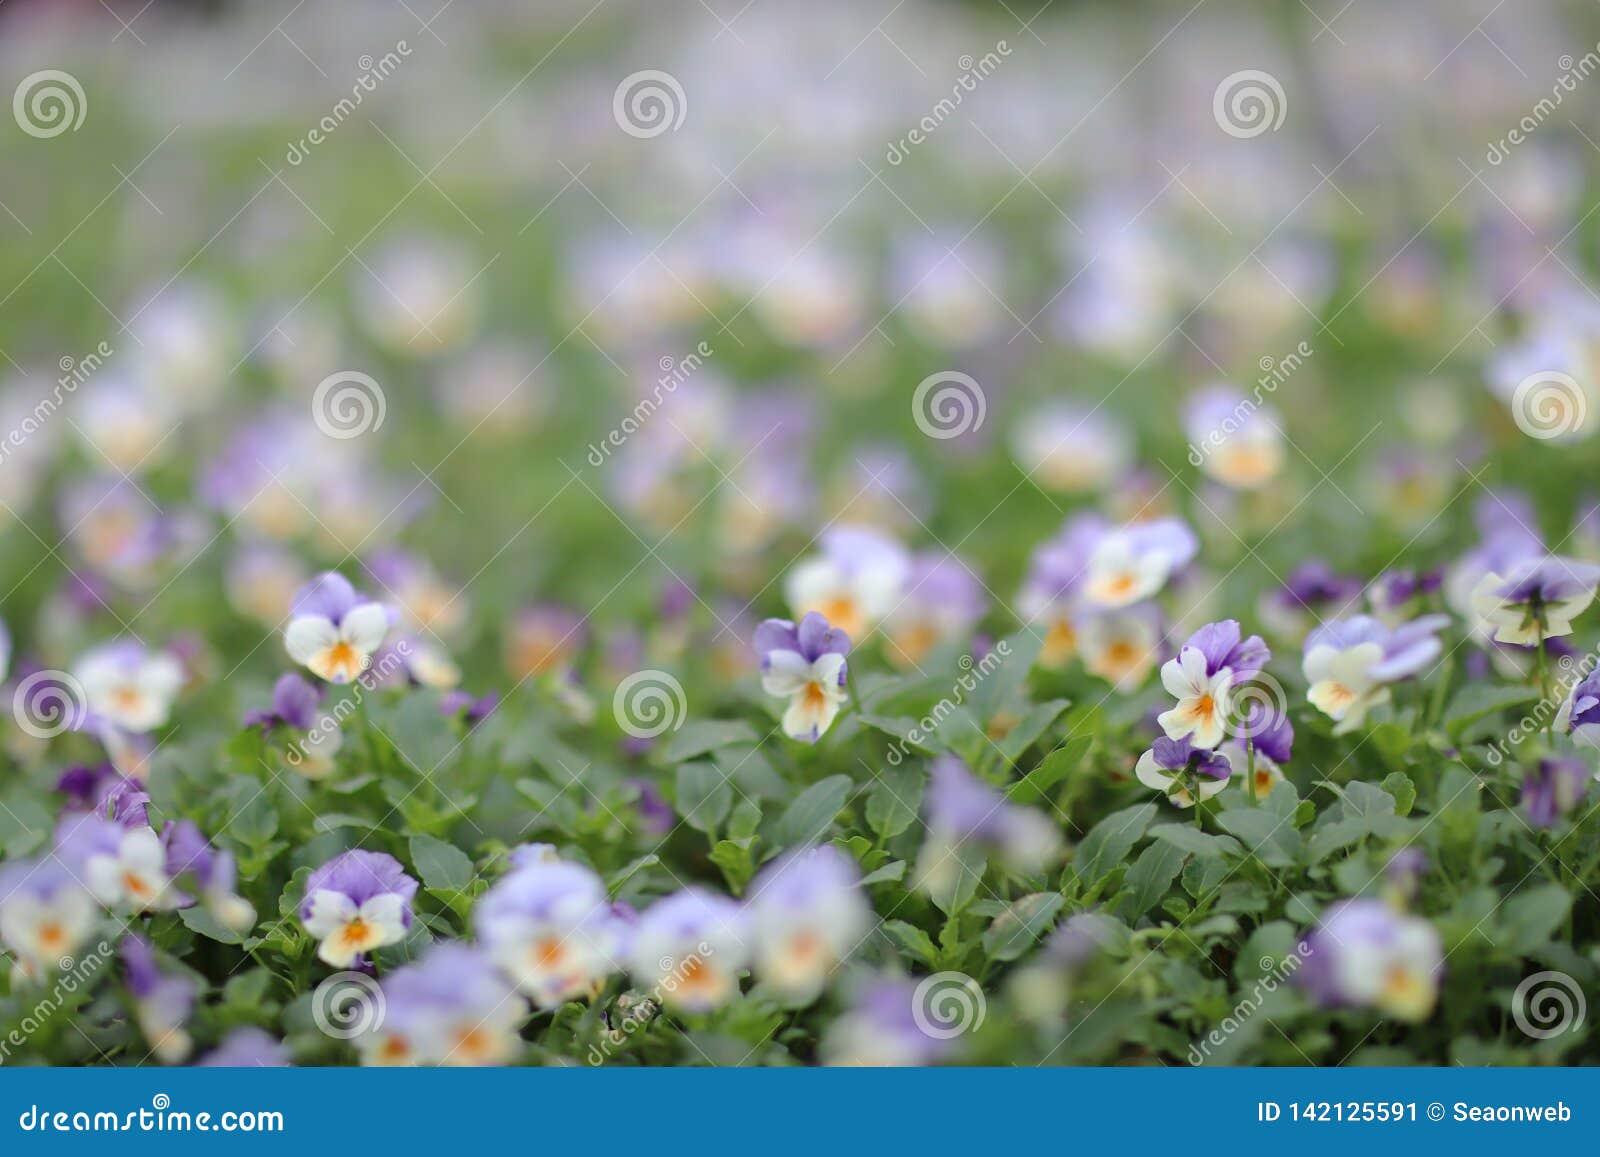 Cornuta Viola, κερασφόρος pansy, σχηματισμένος τούφες pansy